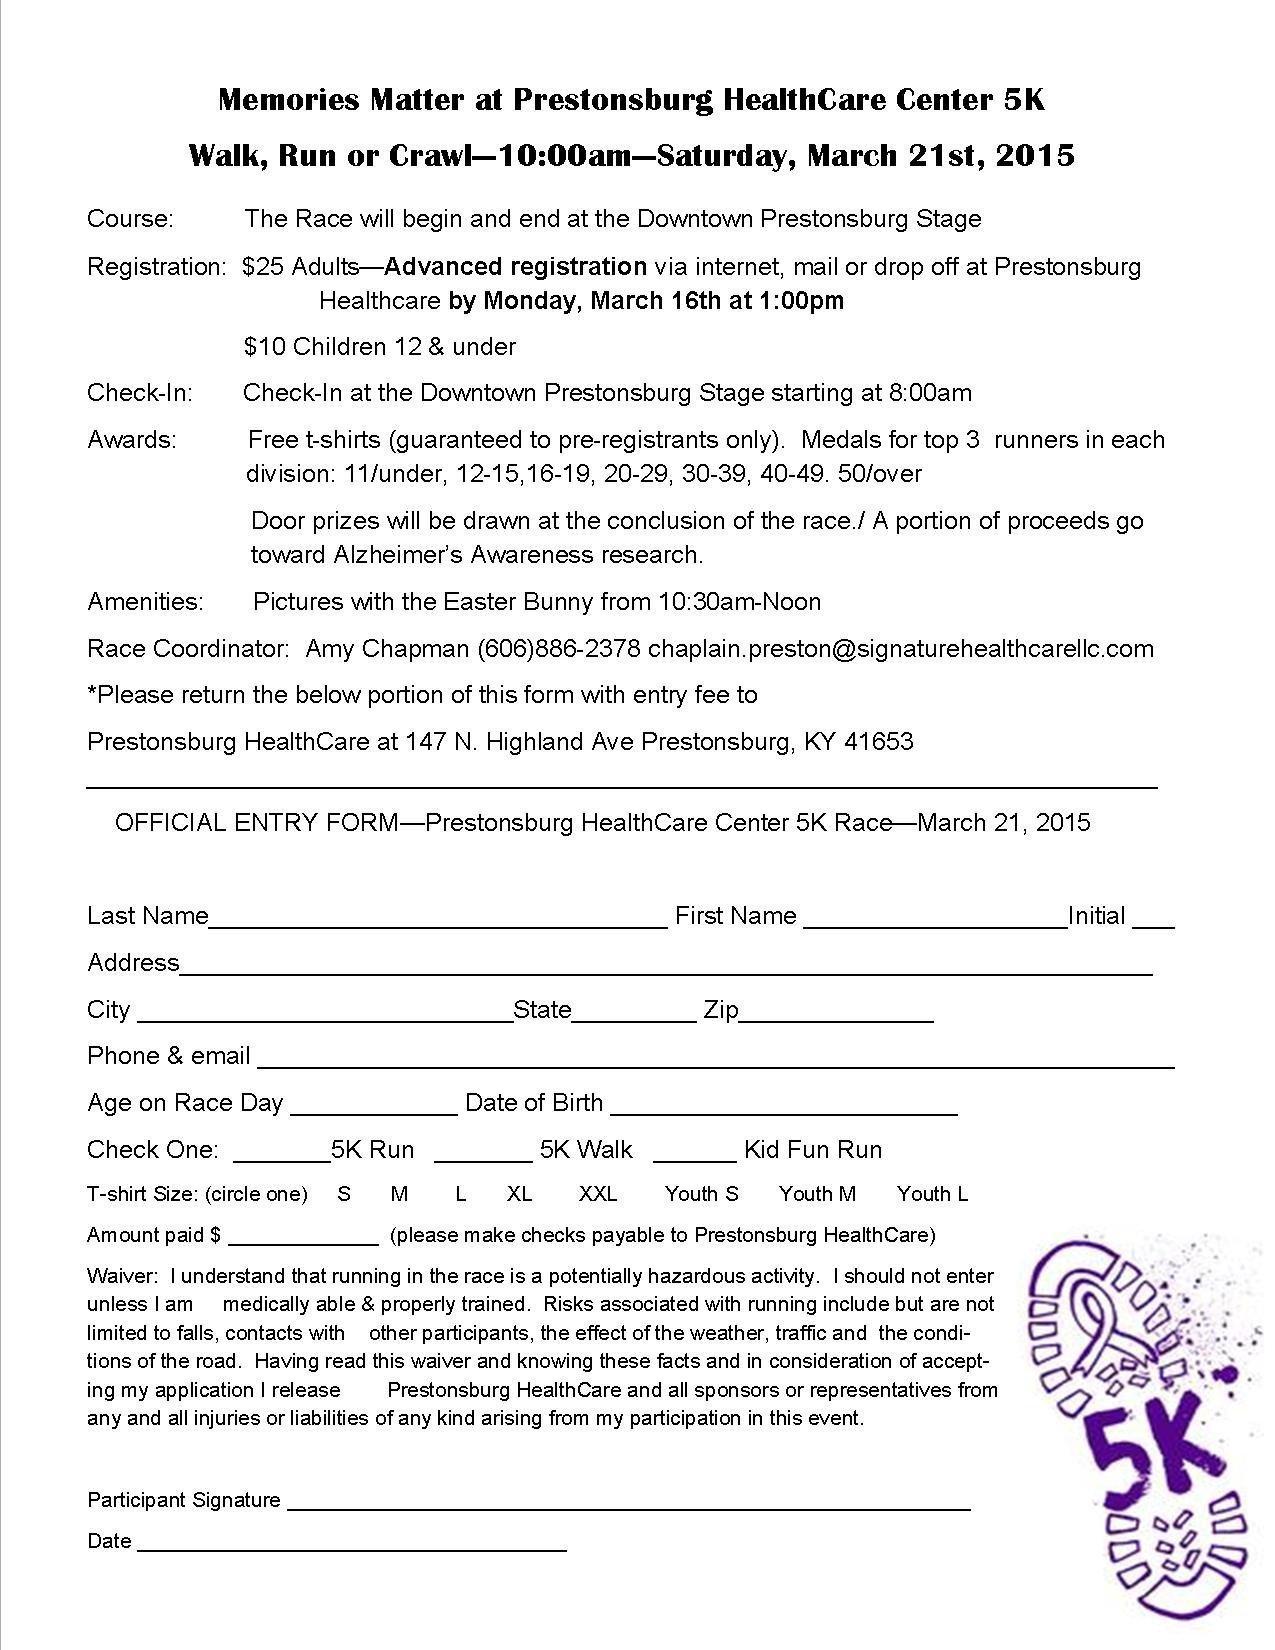 5k Registration form Template Walk Run or Crawl 5k Prestonsburg Health Care Center